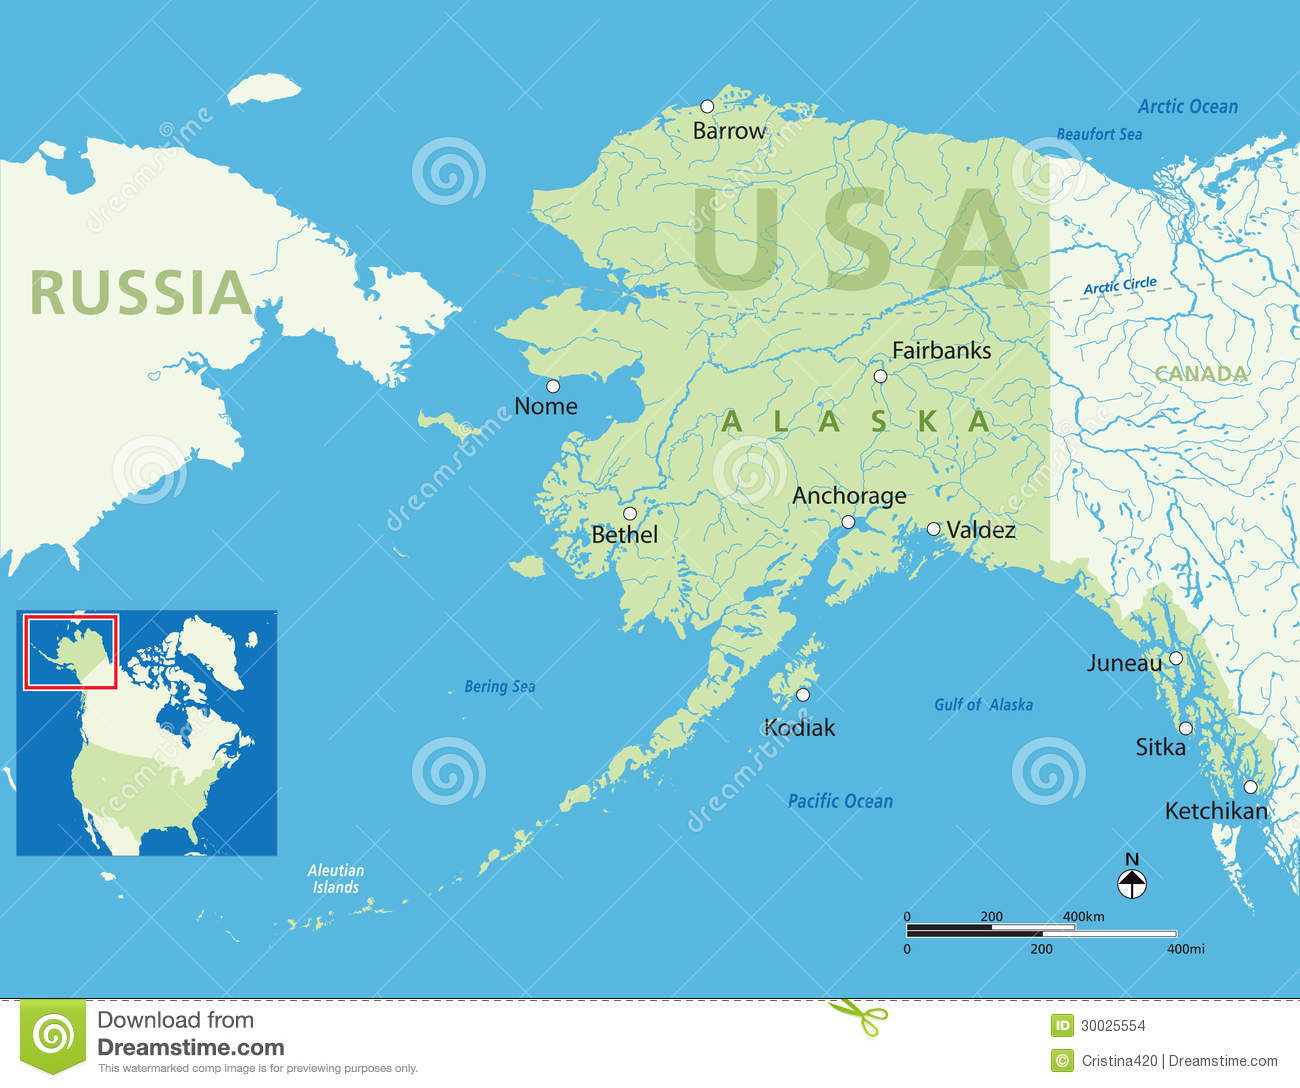 rencontres gratuites en Alaska princesse service de rencontres